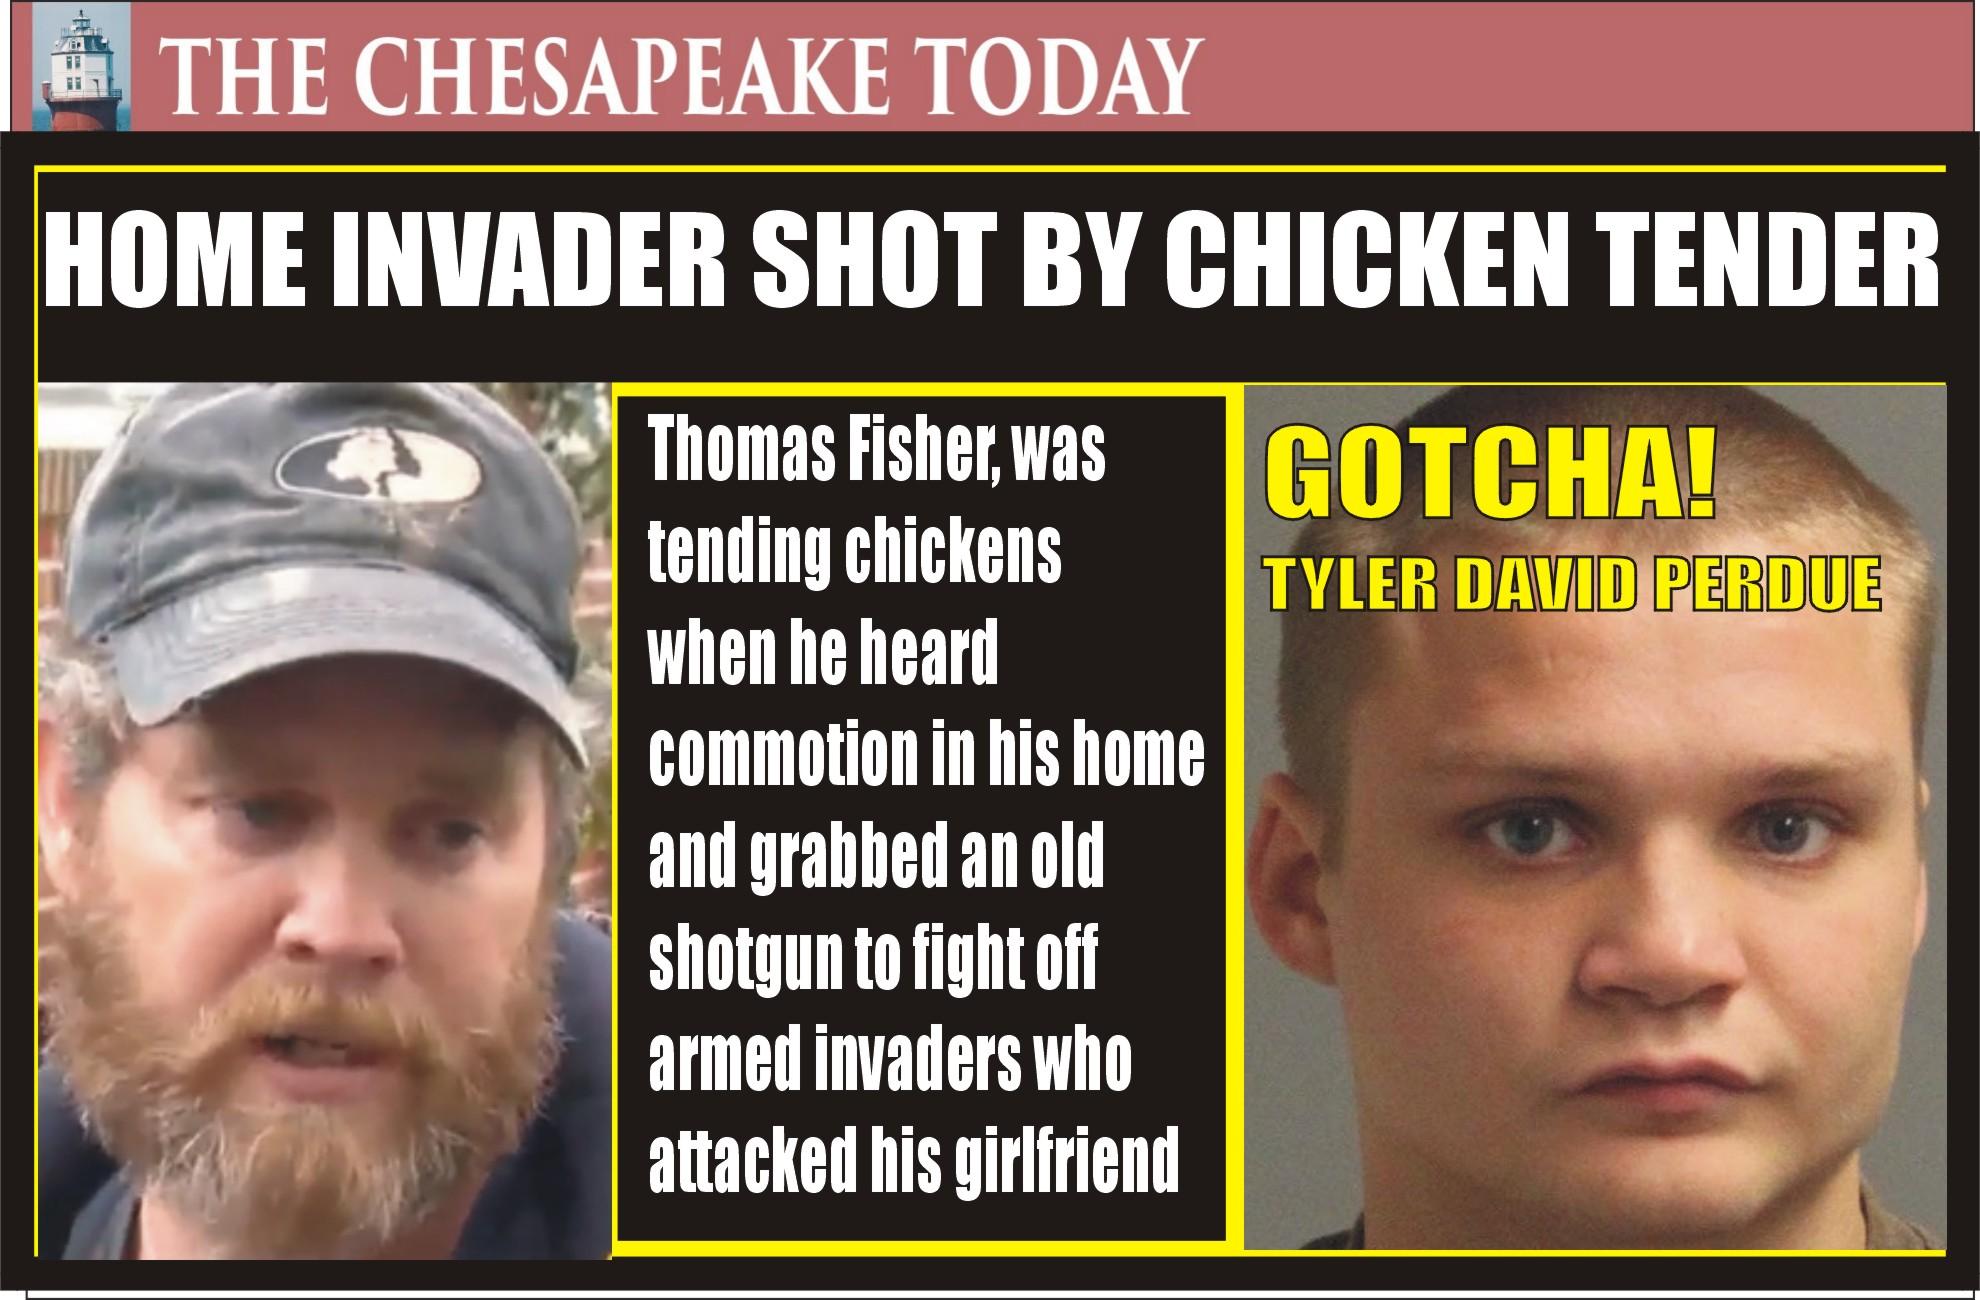 HOME INVADER SHOT BY CHICKEN TENDER; TYLER PERDUE ARRESTED